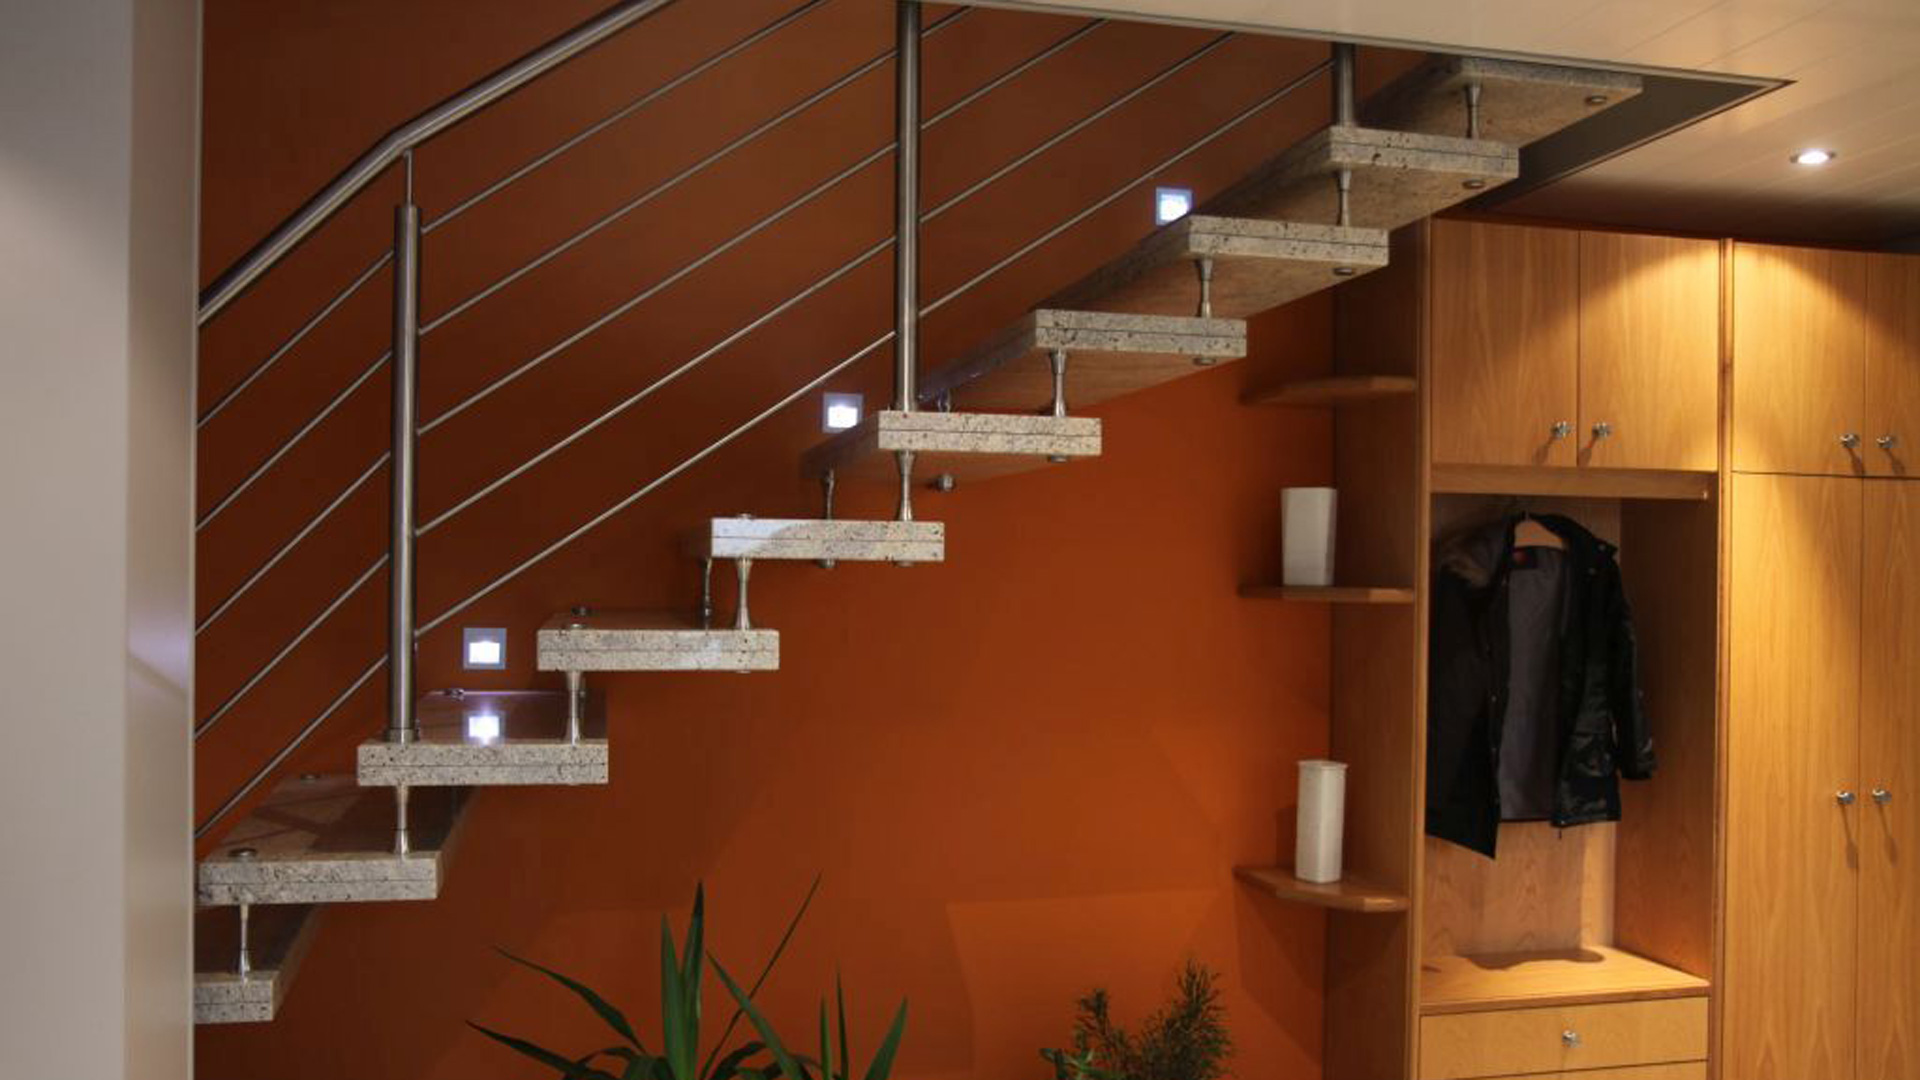 wagner treppenbau gmbh mainleus innentreppen. Black Bedroom Furniture Sets. Home Design Ideas